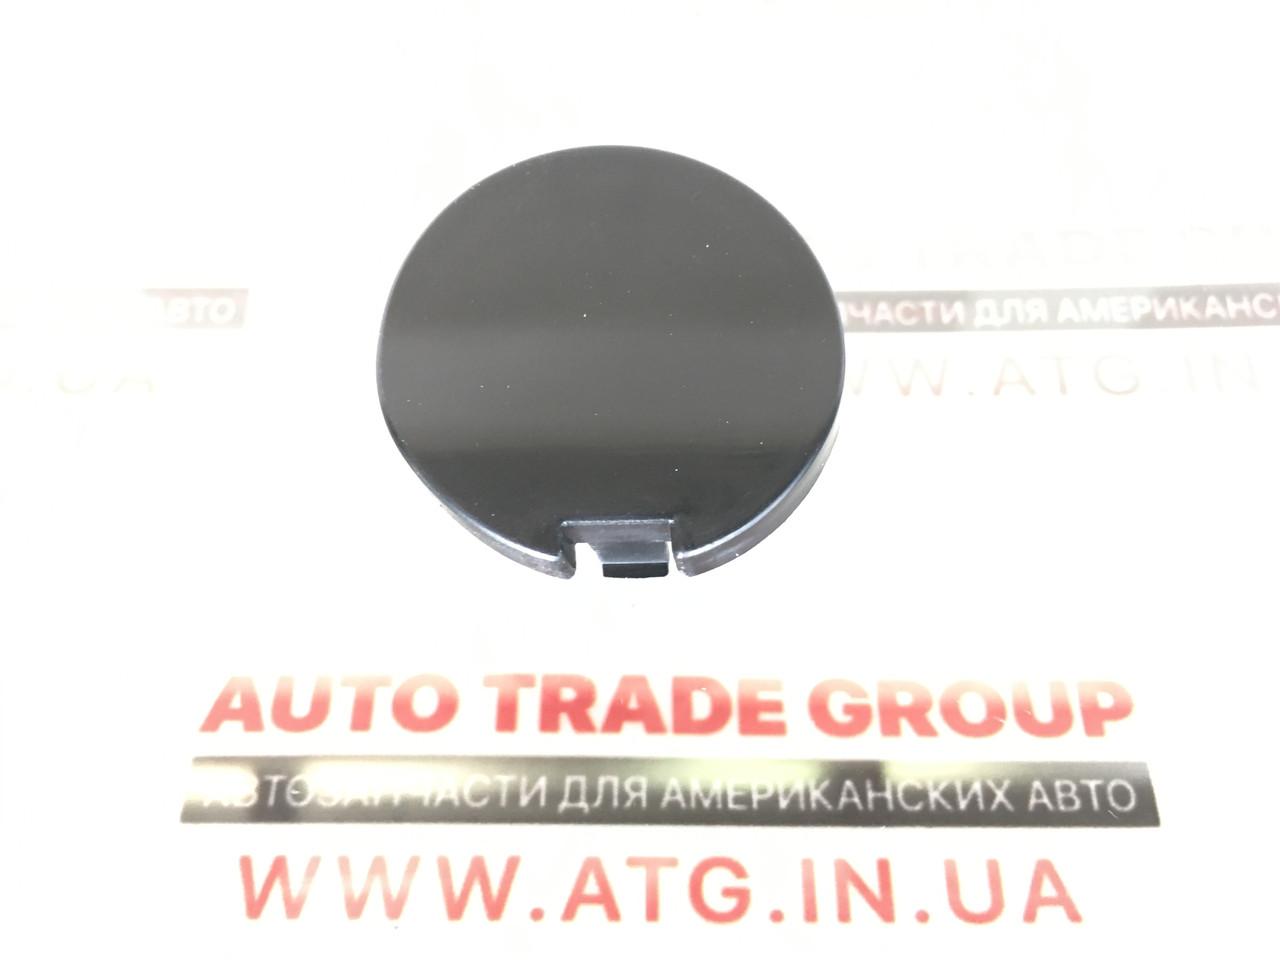 Заглушка буксировочного крюка заднього бампера FORD KUGA ESCAPE 2013 CV44 17K922-AD5BQH